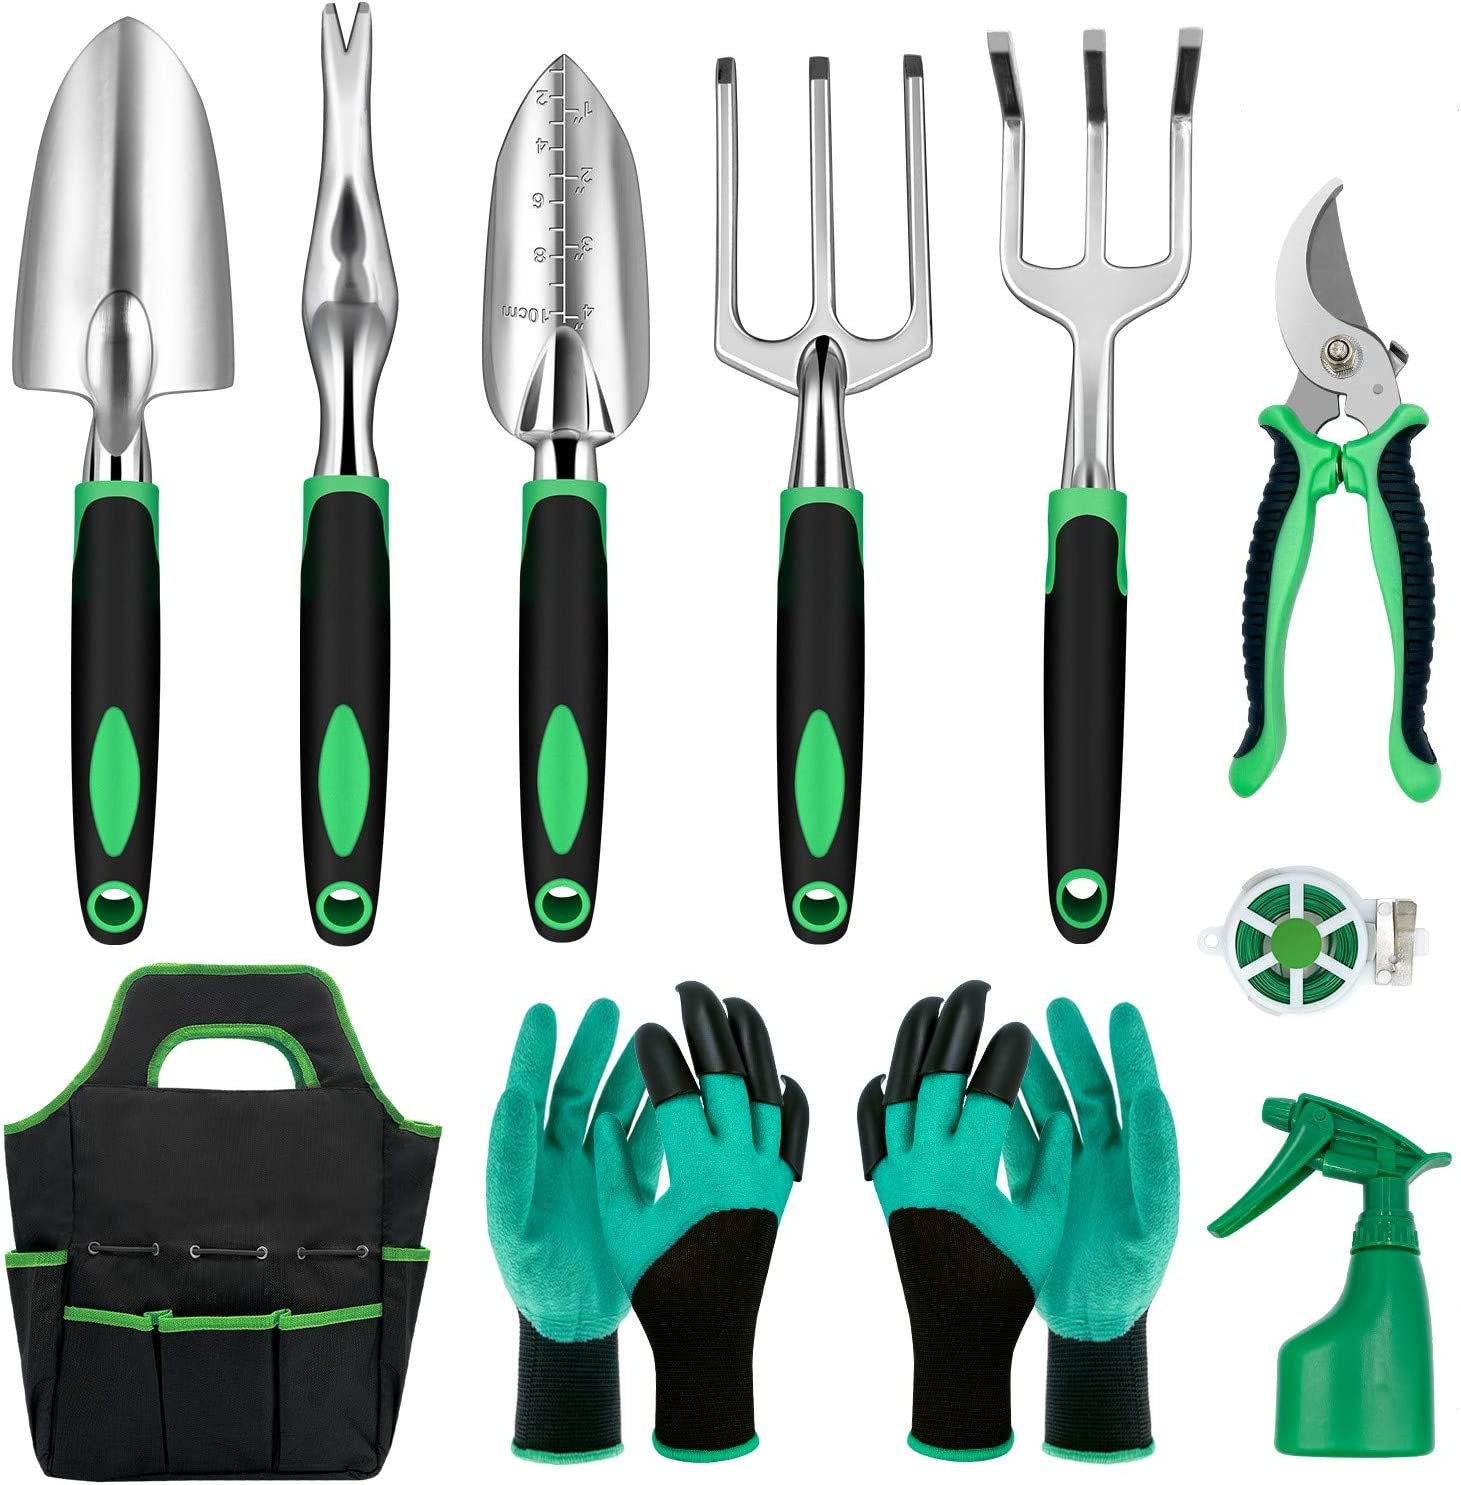 Penfold 11 Pieces Garden Tools Set- Outdoor Aluminum Heavy Duty Gardening Tools with Garden Gloves and Organizer Tote Bag, Vegetable Gardening Supplies Hand Tools, Gardening Gifts for Men Women Kids